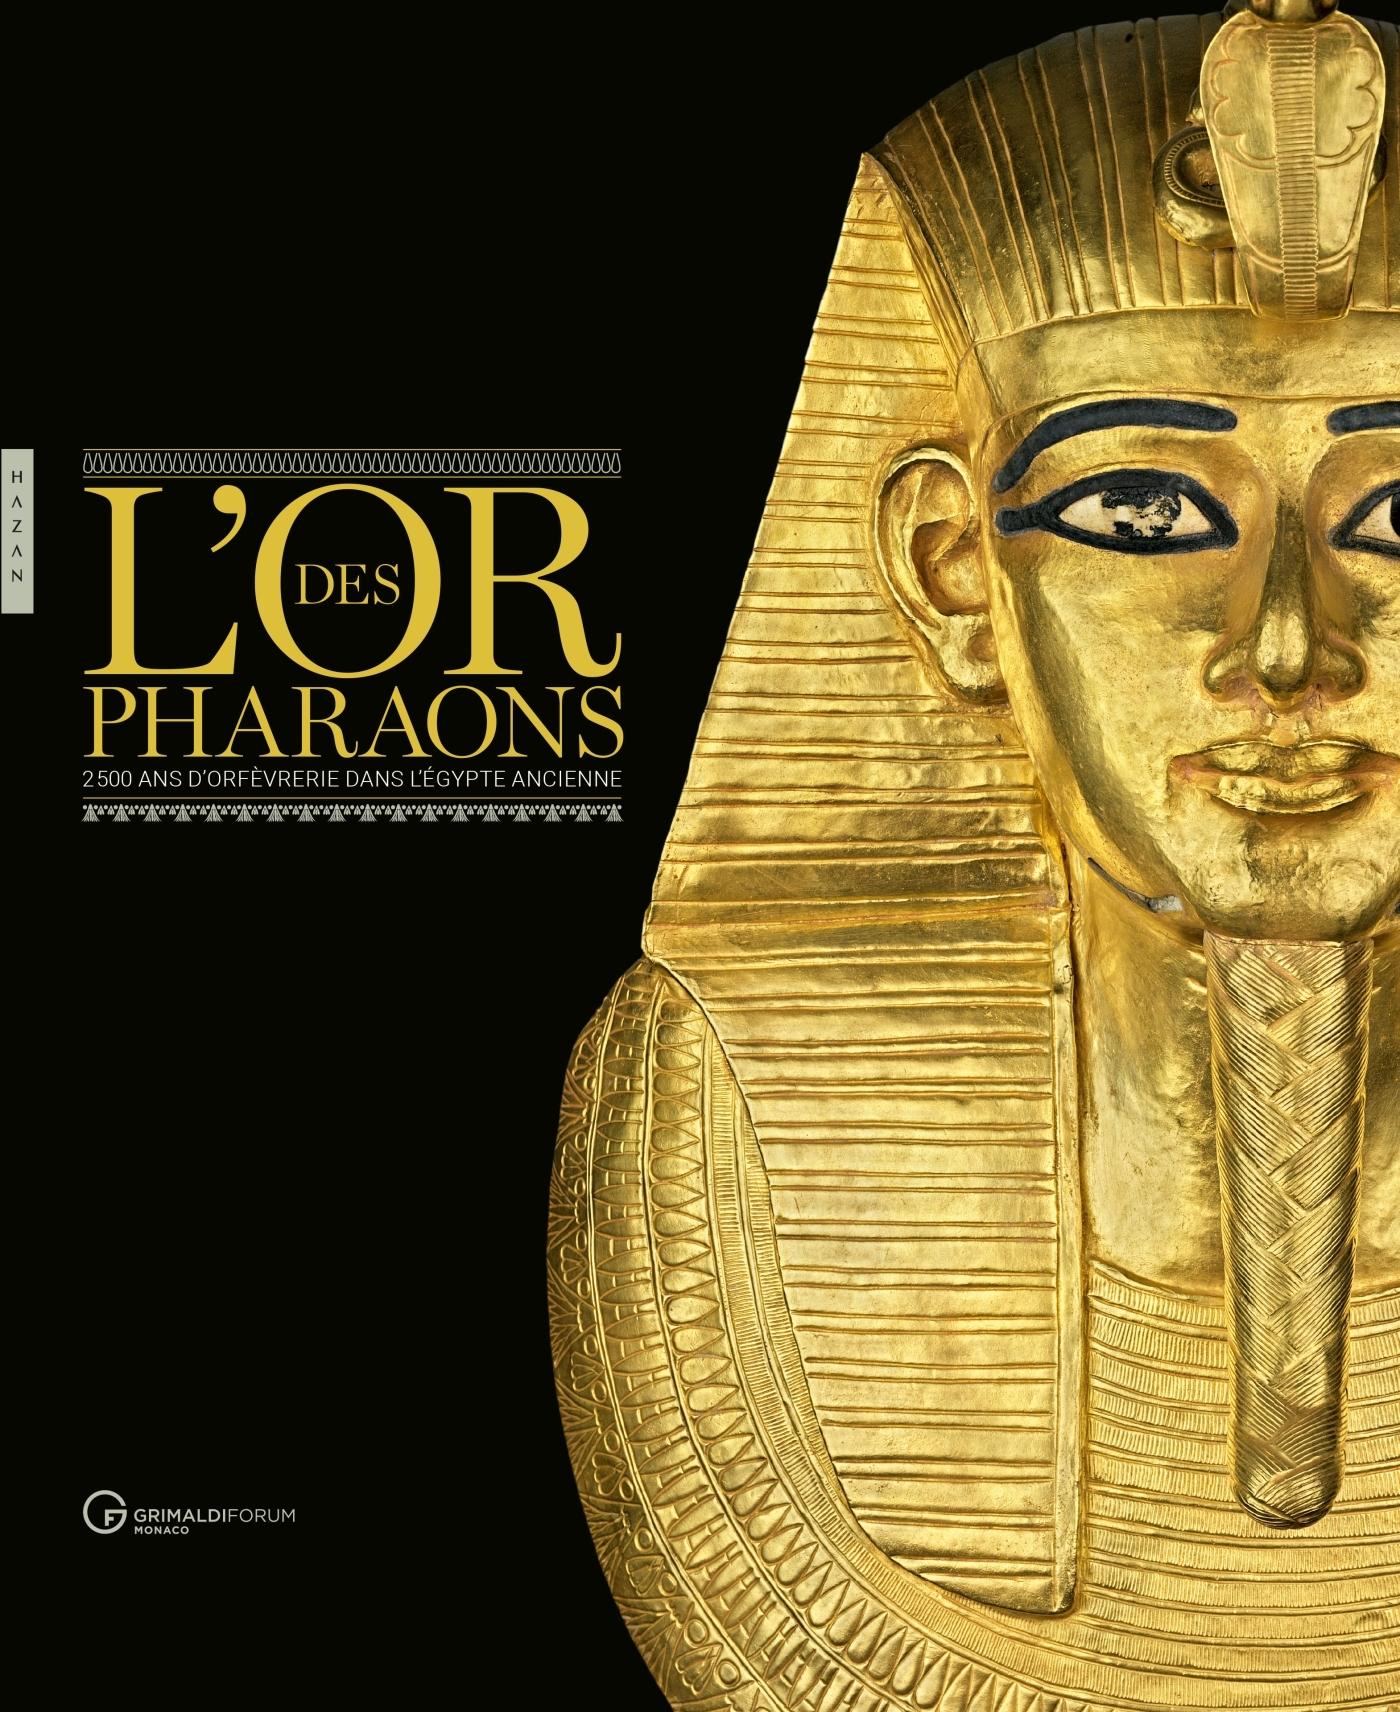 L'OR DES PHARAONS 2500 D'ORFEVRERIE DANS L'EGYPTE ANCIENNE